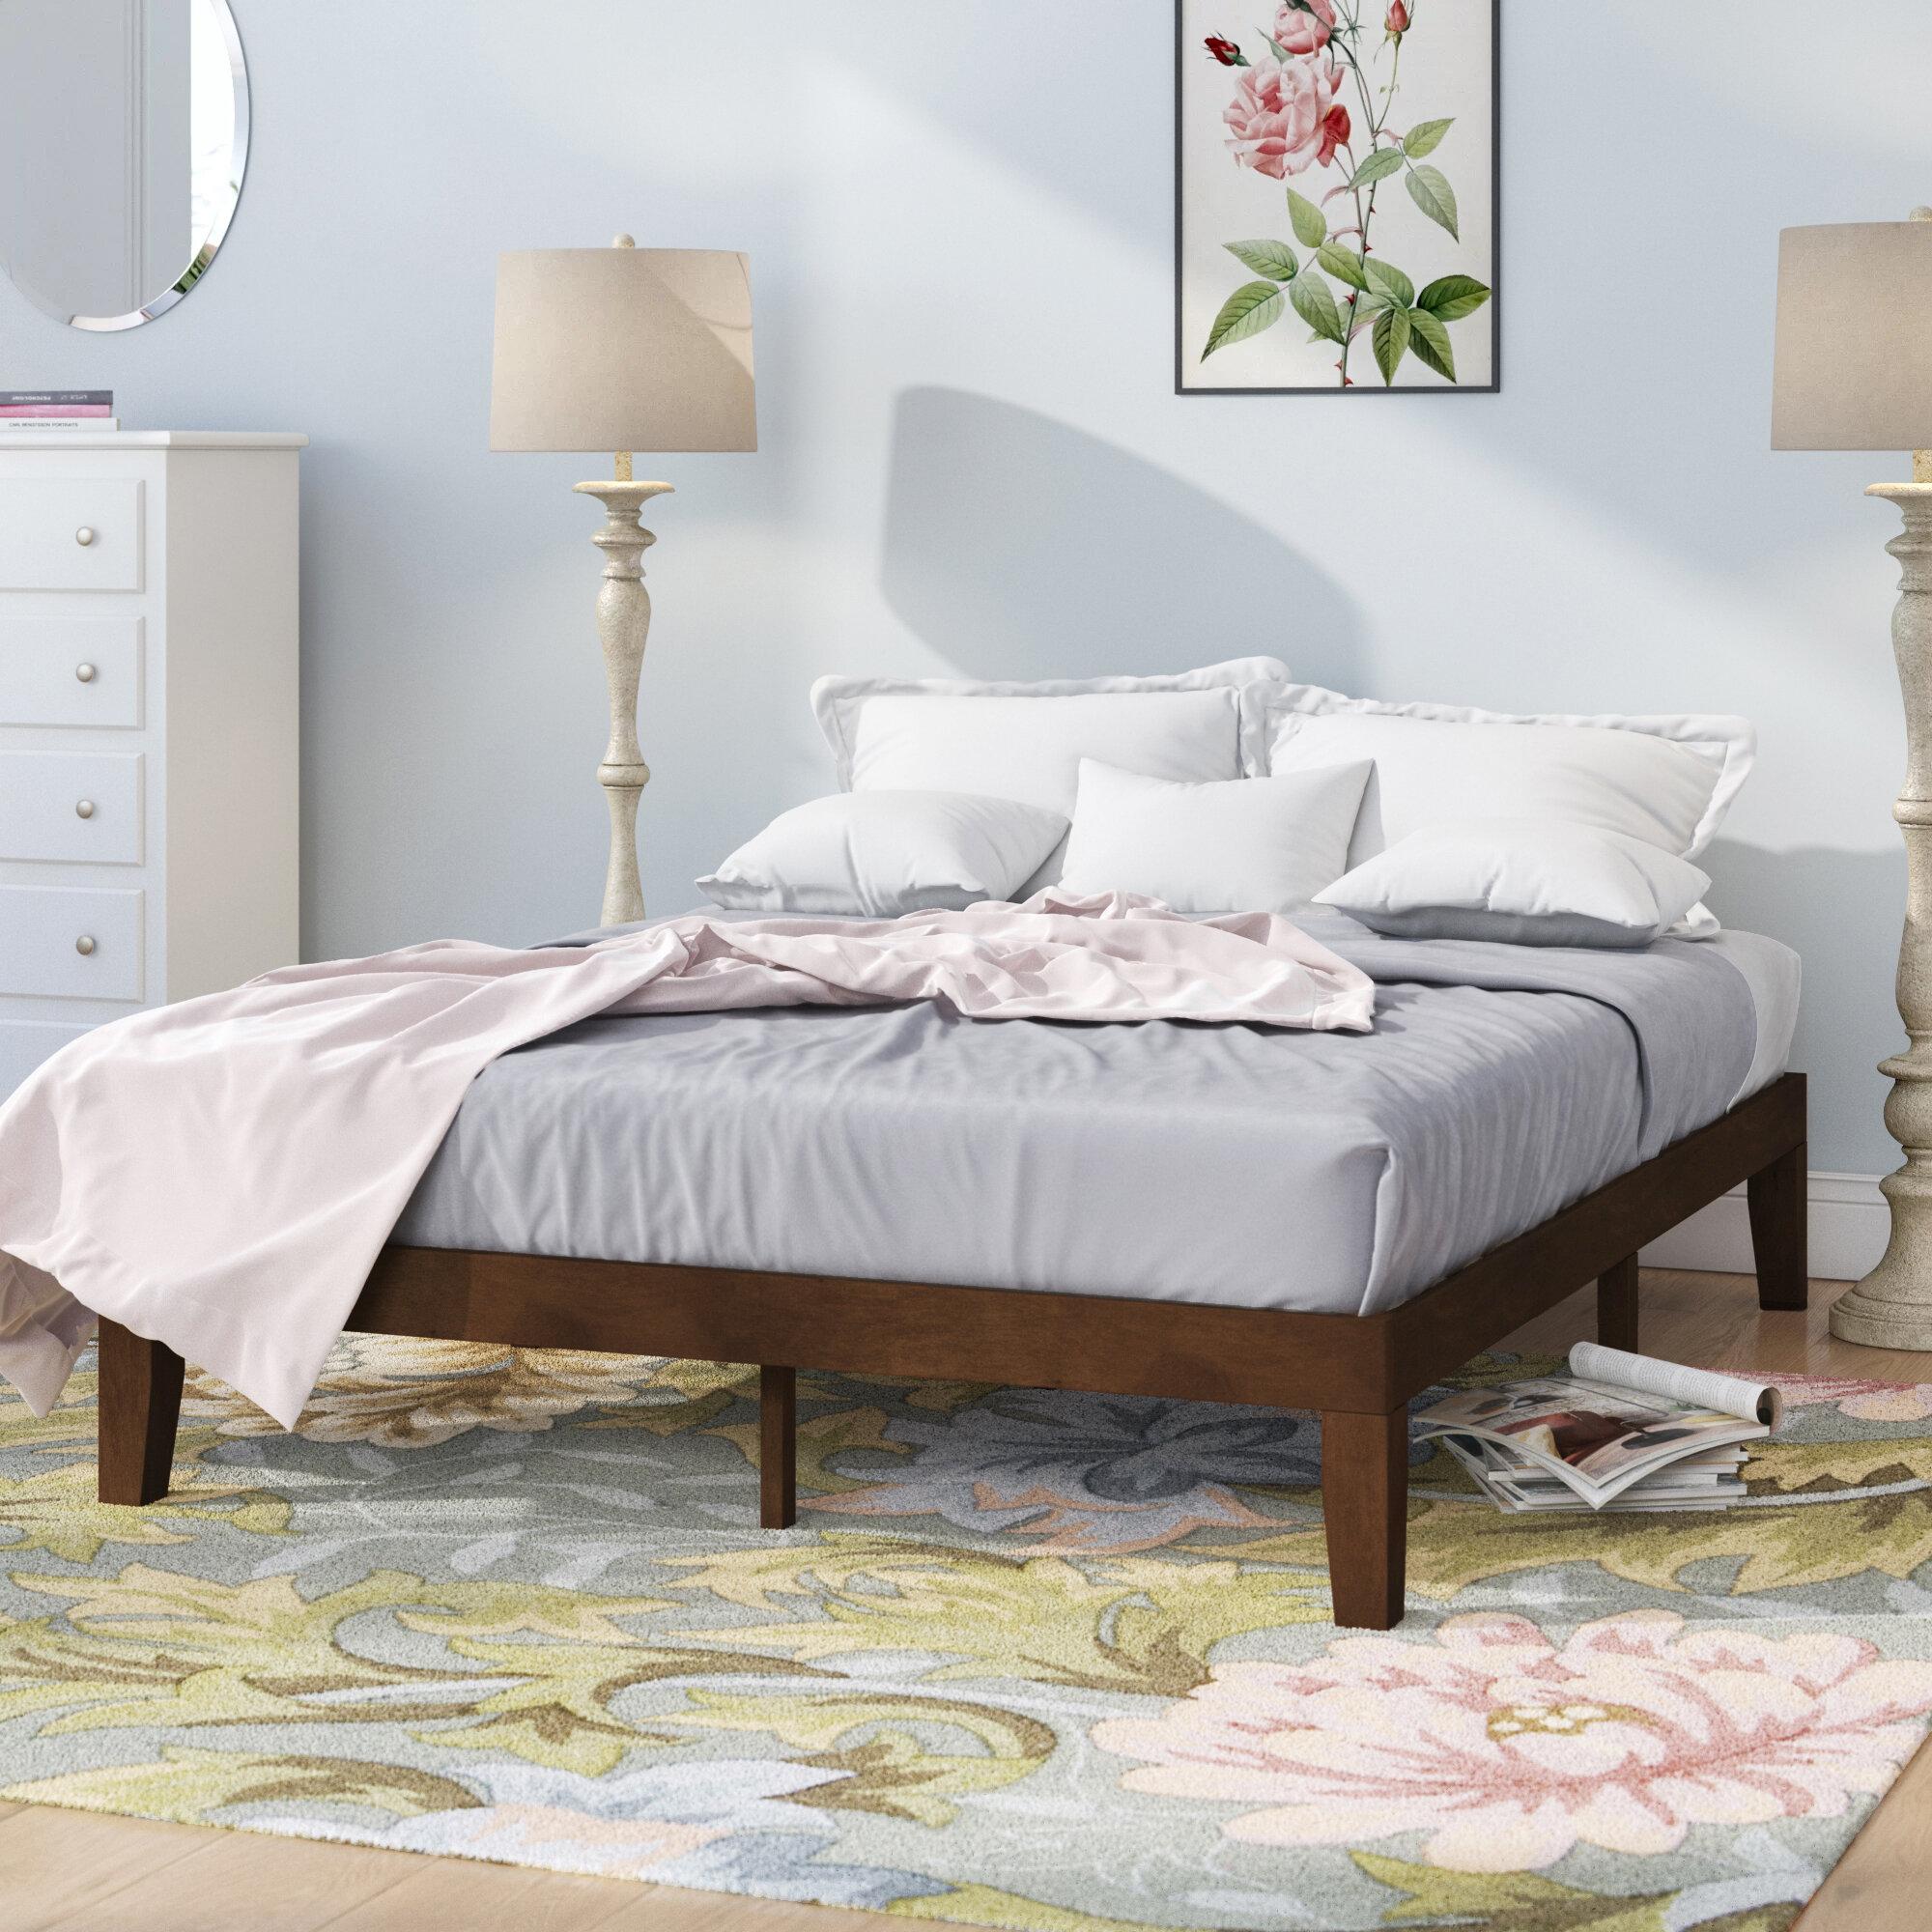 Red Barrel Studio Harlow Solid Wood Platform Bed Reviews Wayfair